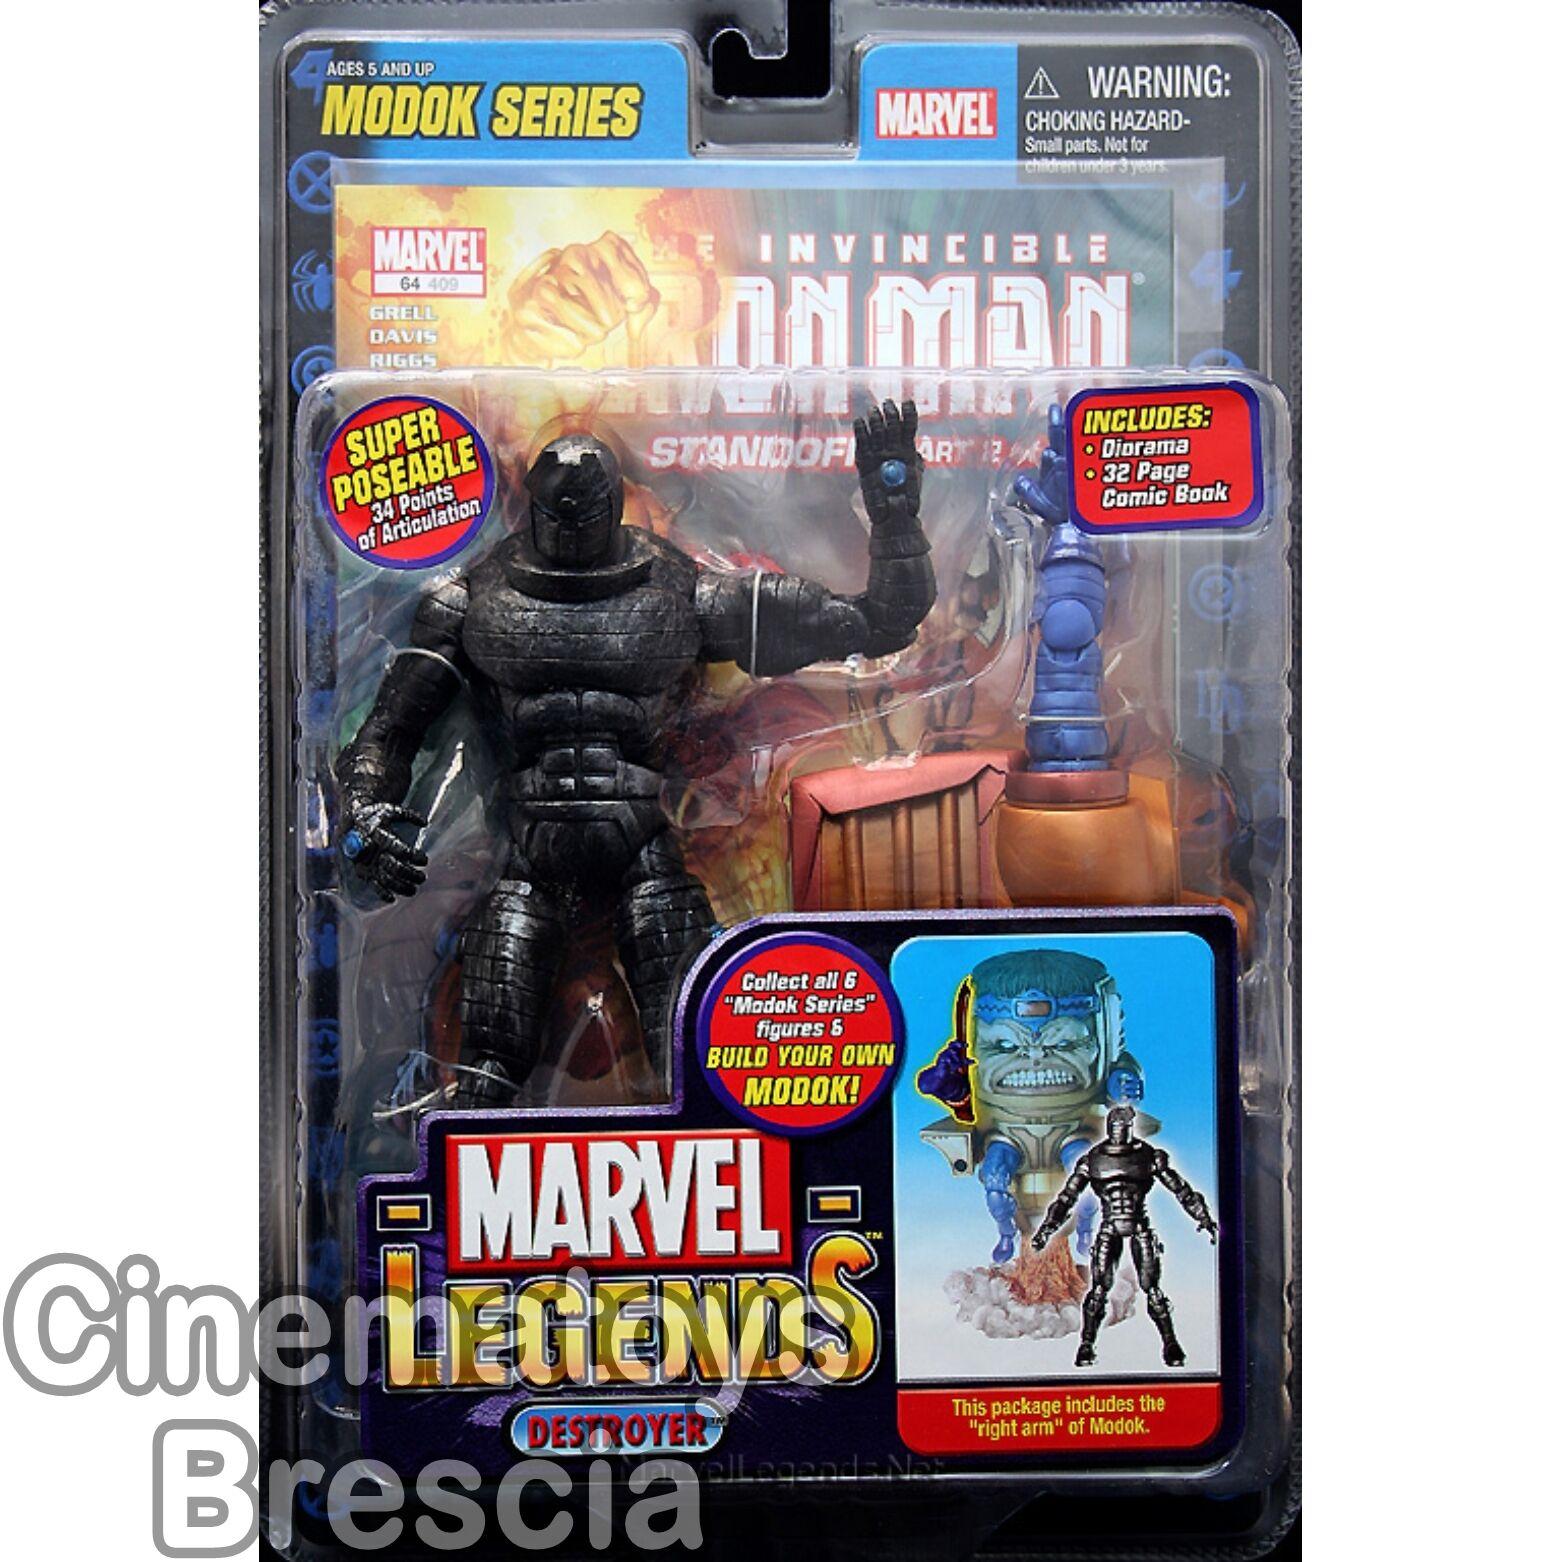 Thor Comics MARVEL Legends MODOK Series DESTROYER Variant Action Figure rara